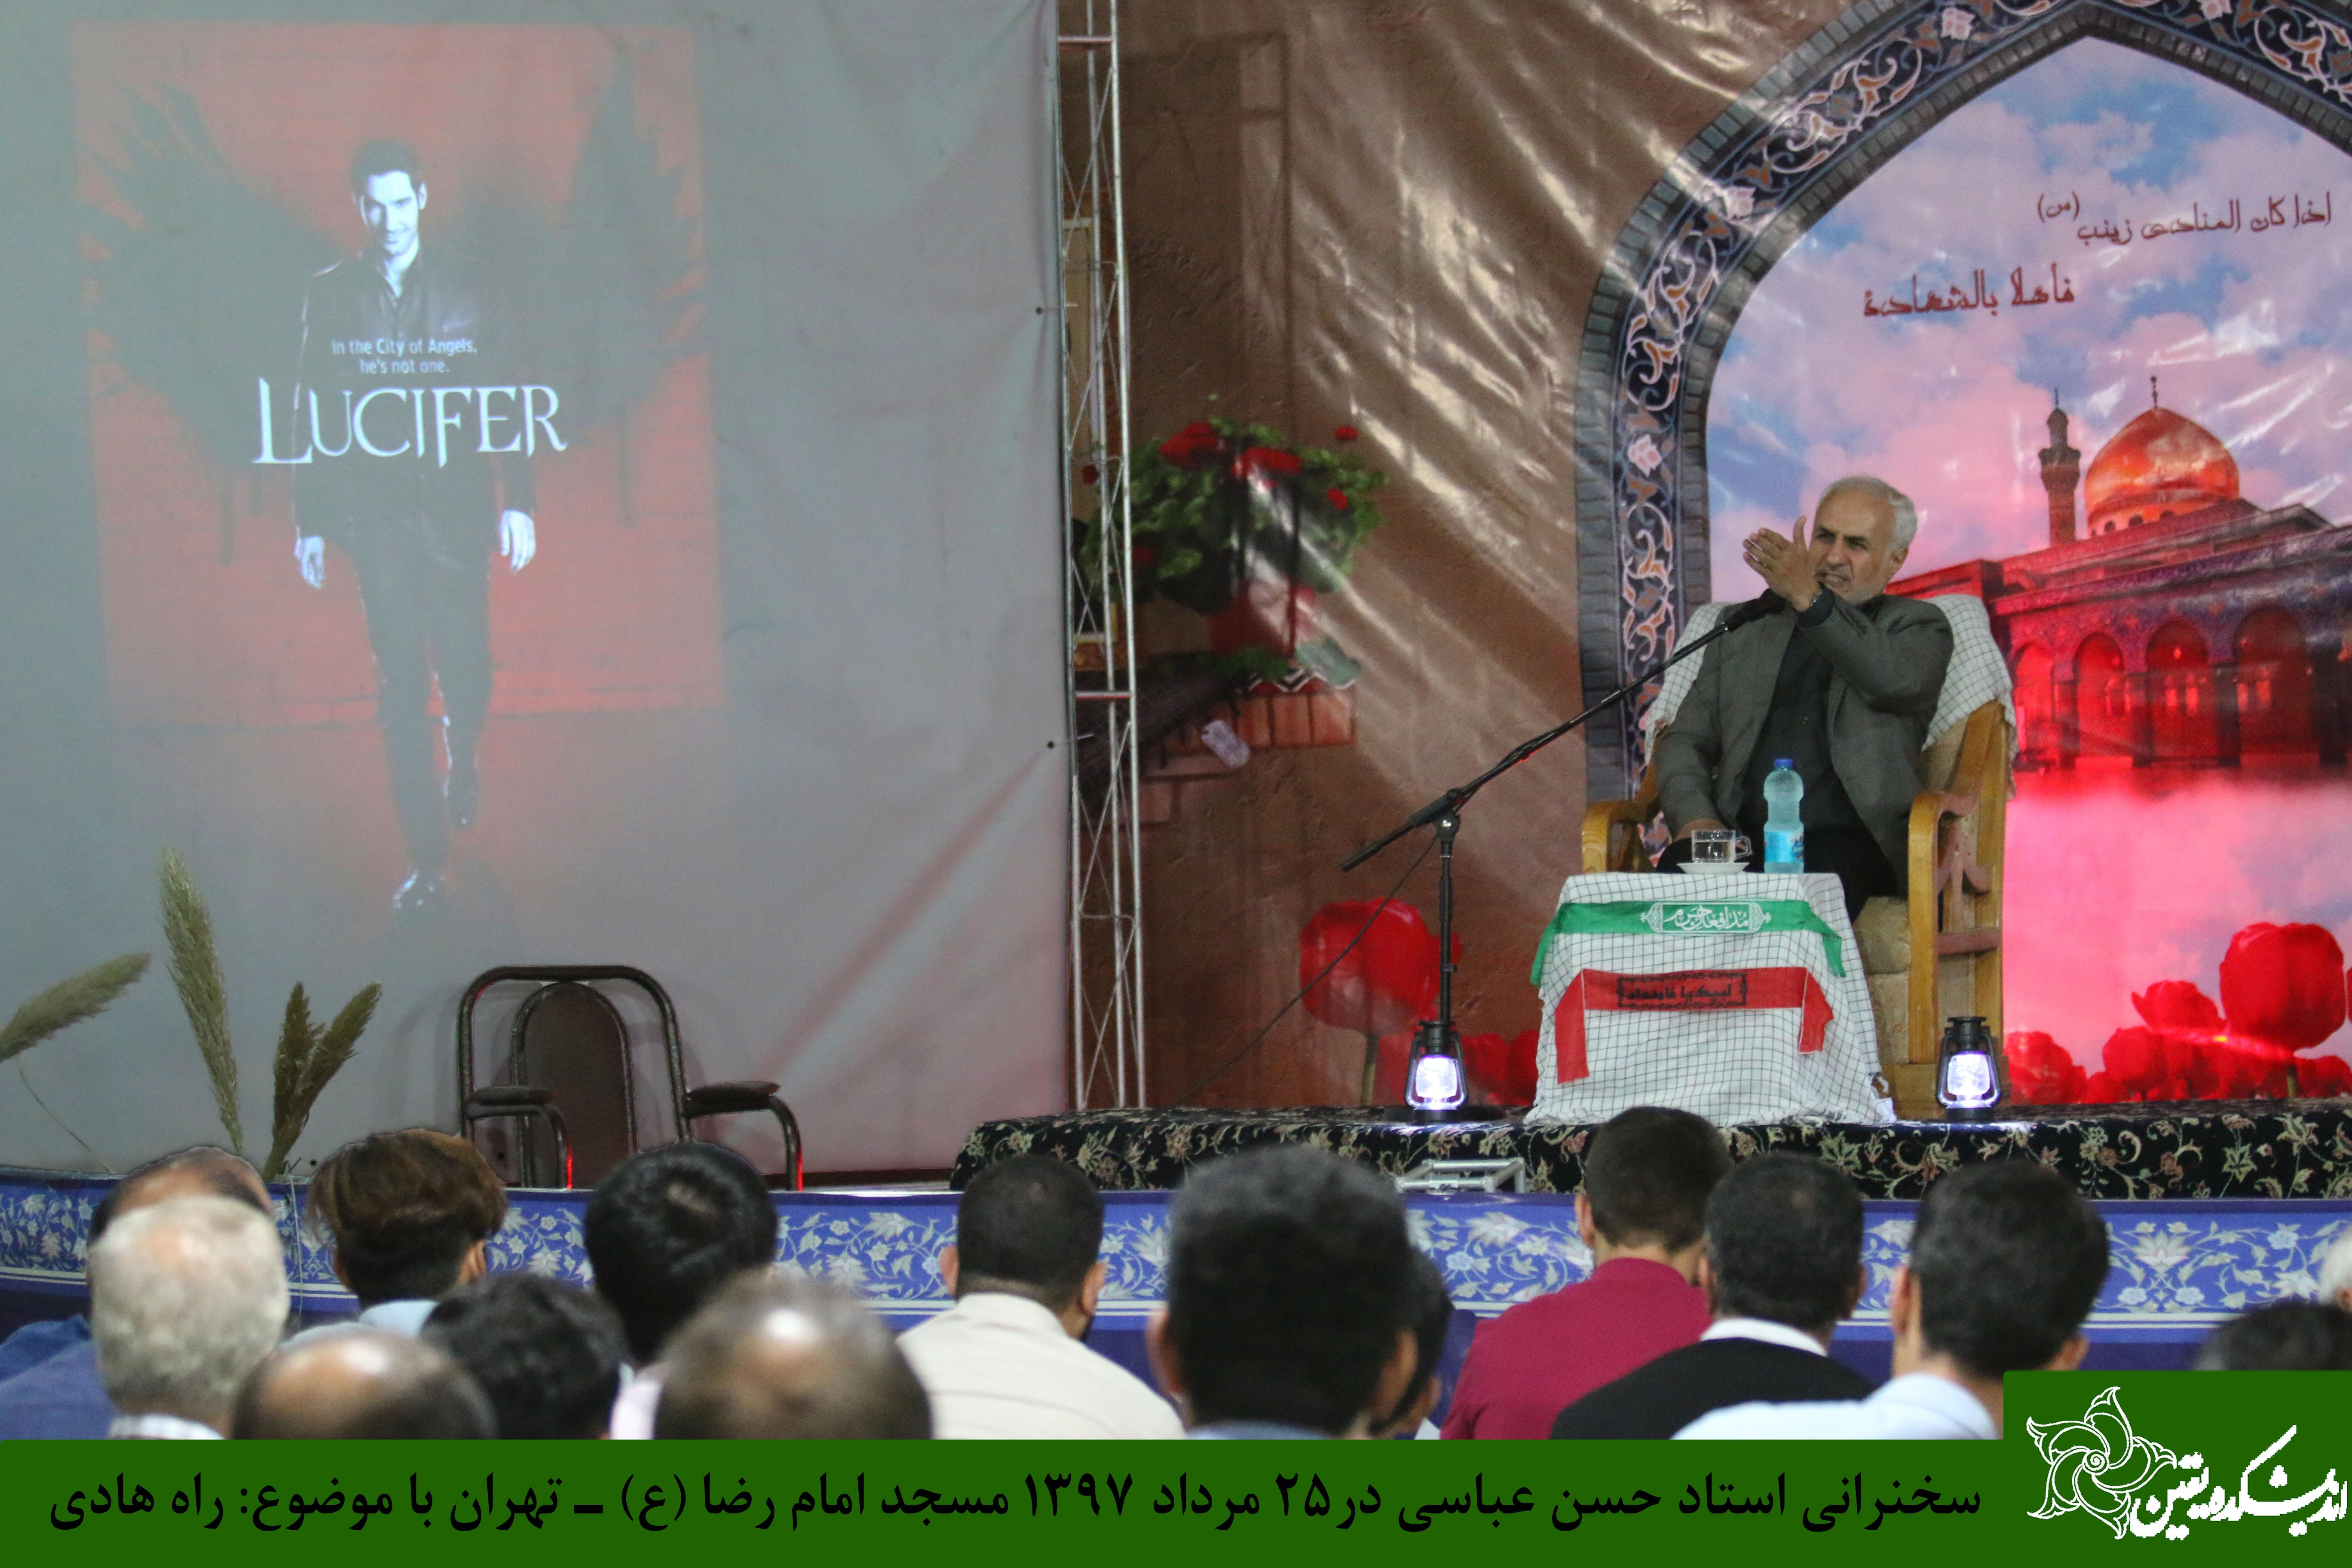 IMG 970525%20%287%29 نقل از تصویری؛ سخنرانی استاد حسن عباسی با موضوع راه هادی